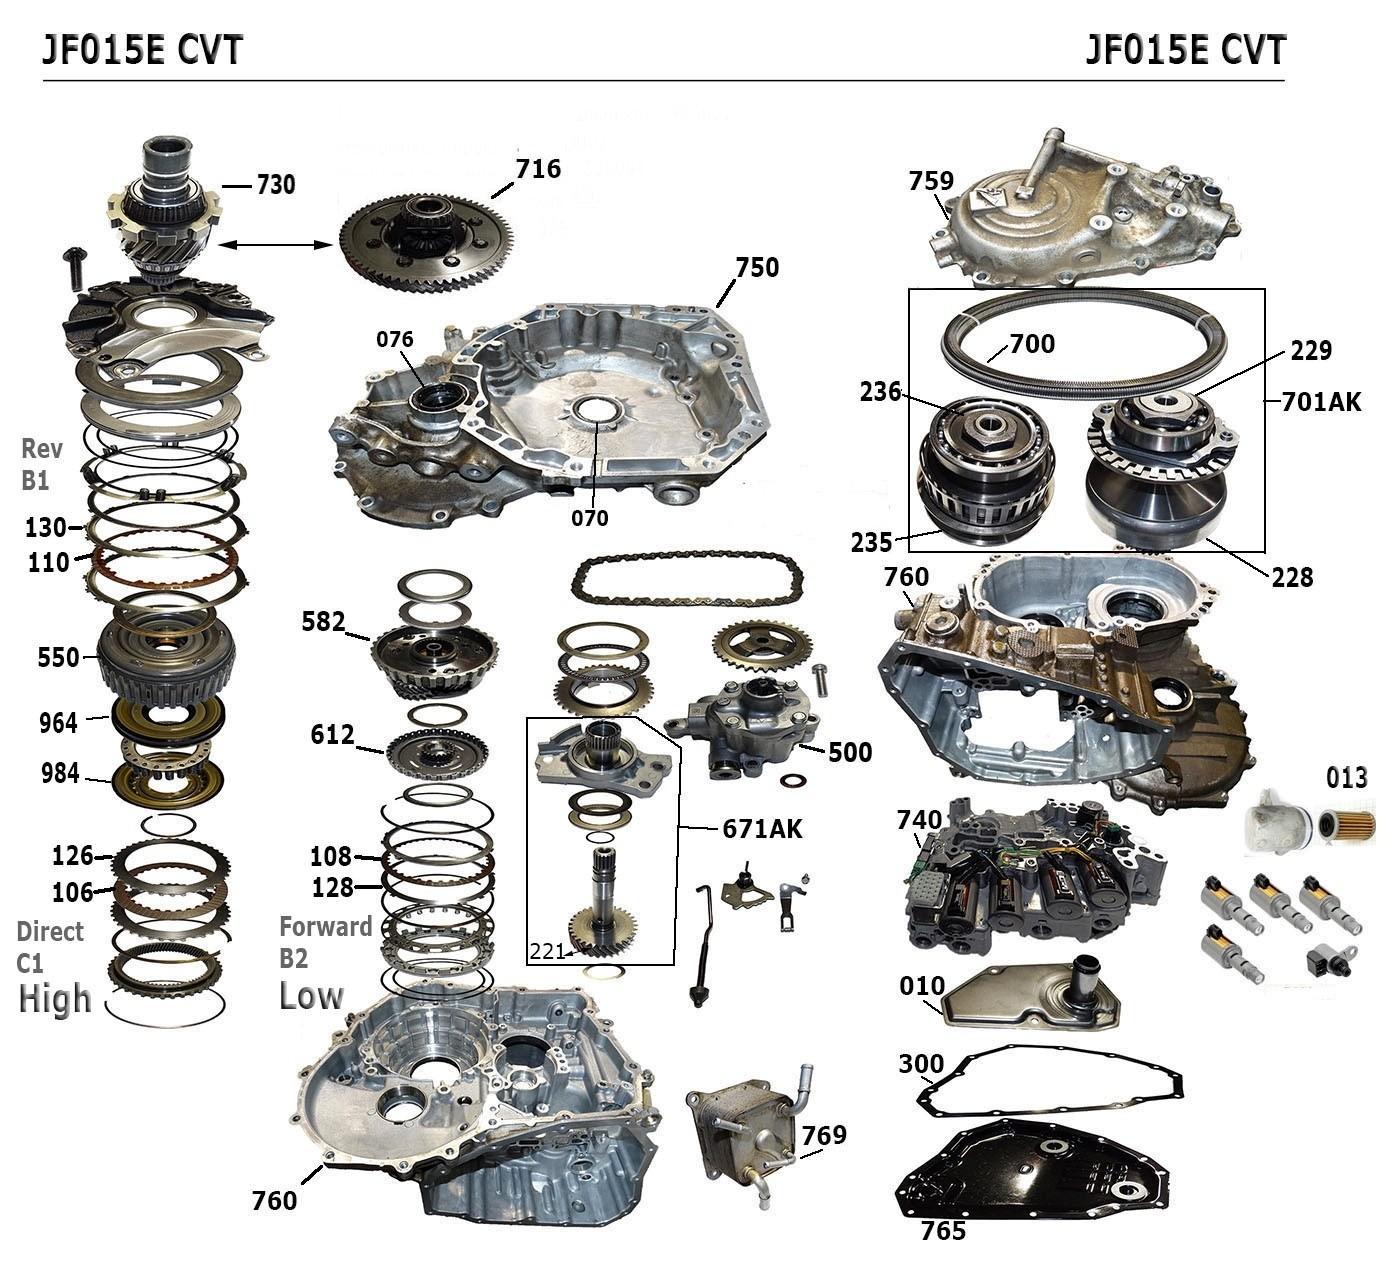 JF015E CVT Nissan